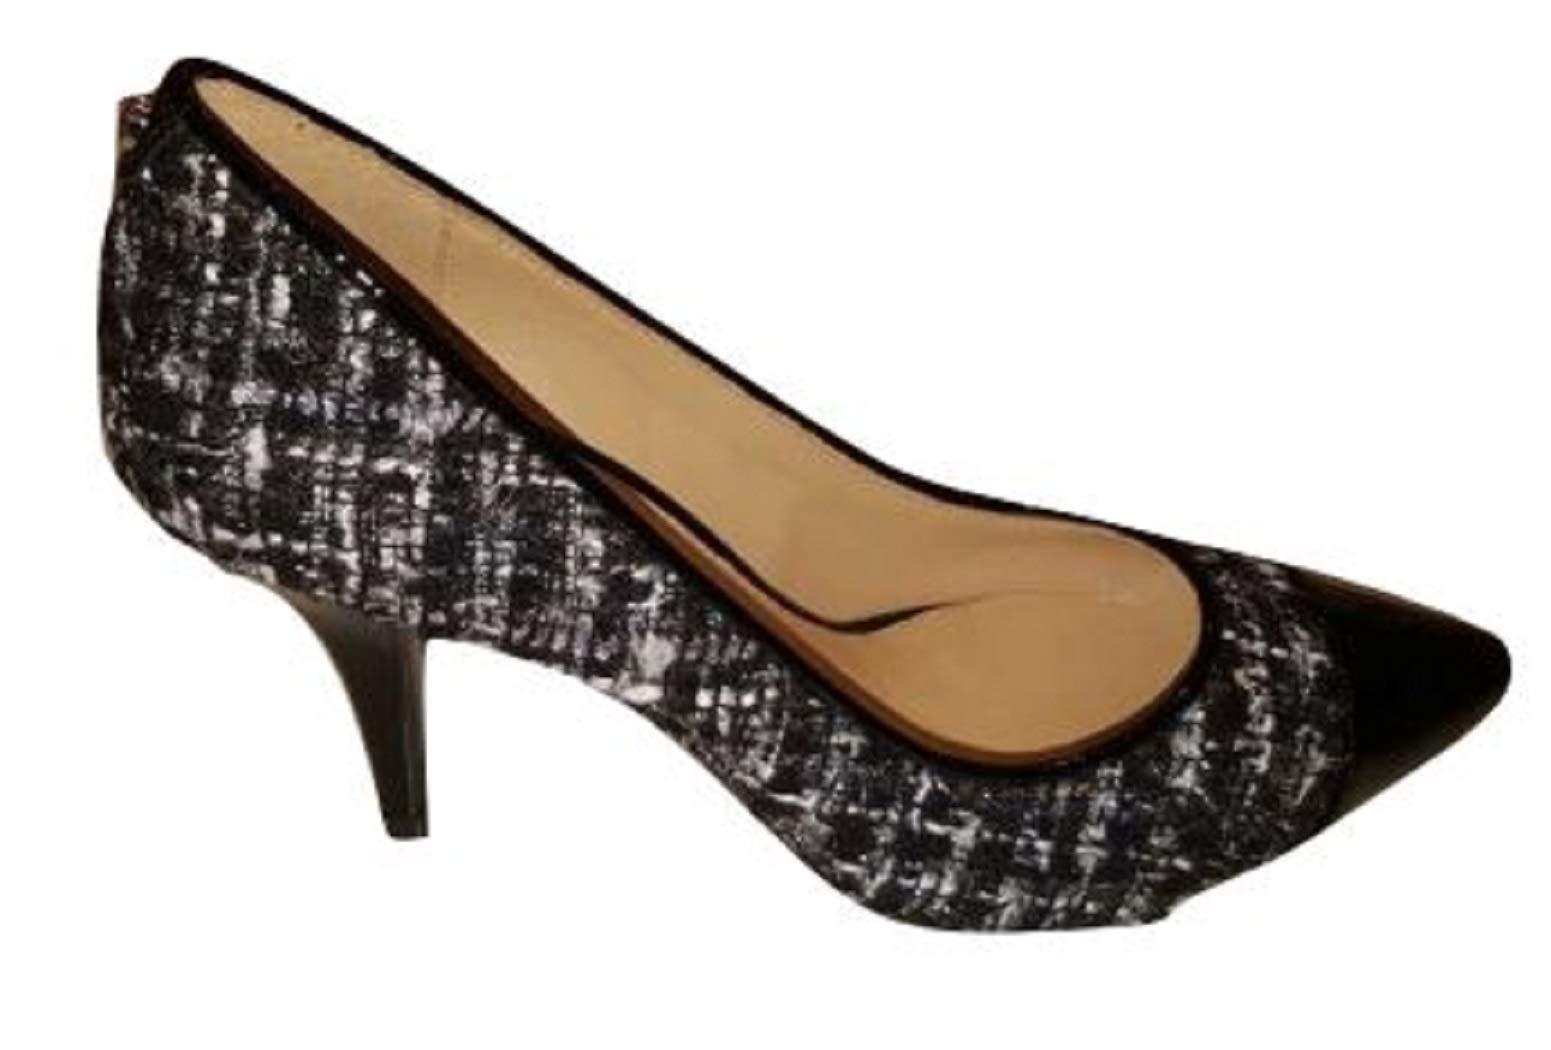 F6702 Decollete Donna Black/White/Silver MICHAEL KORS Patent/Tissue Shoe Woman